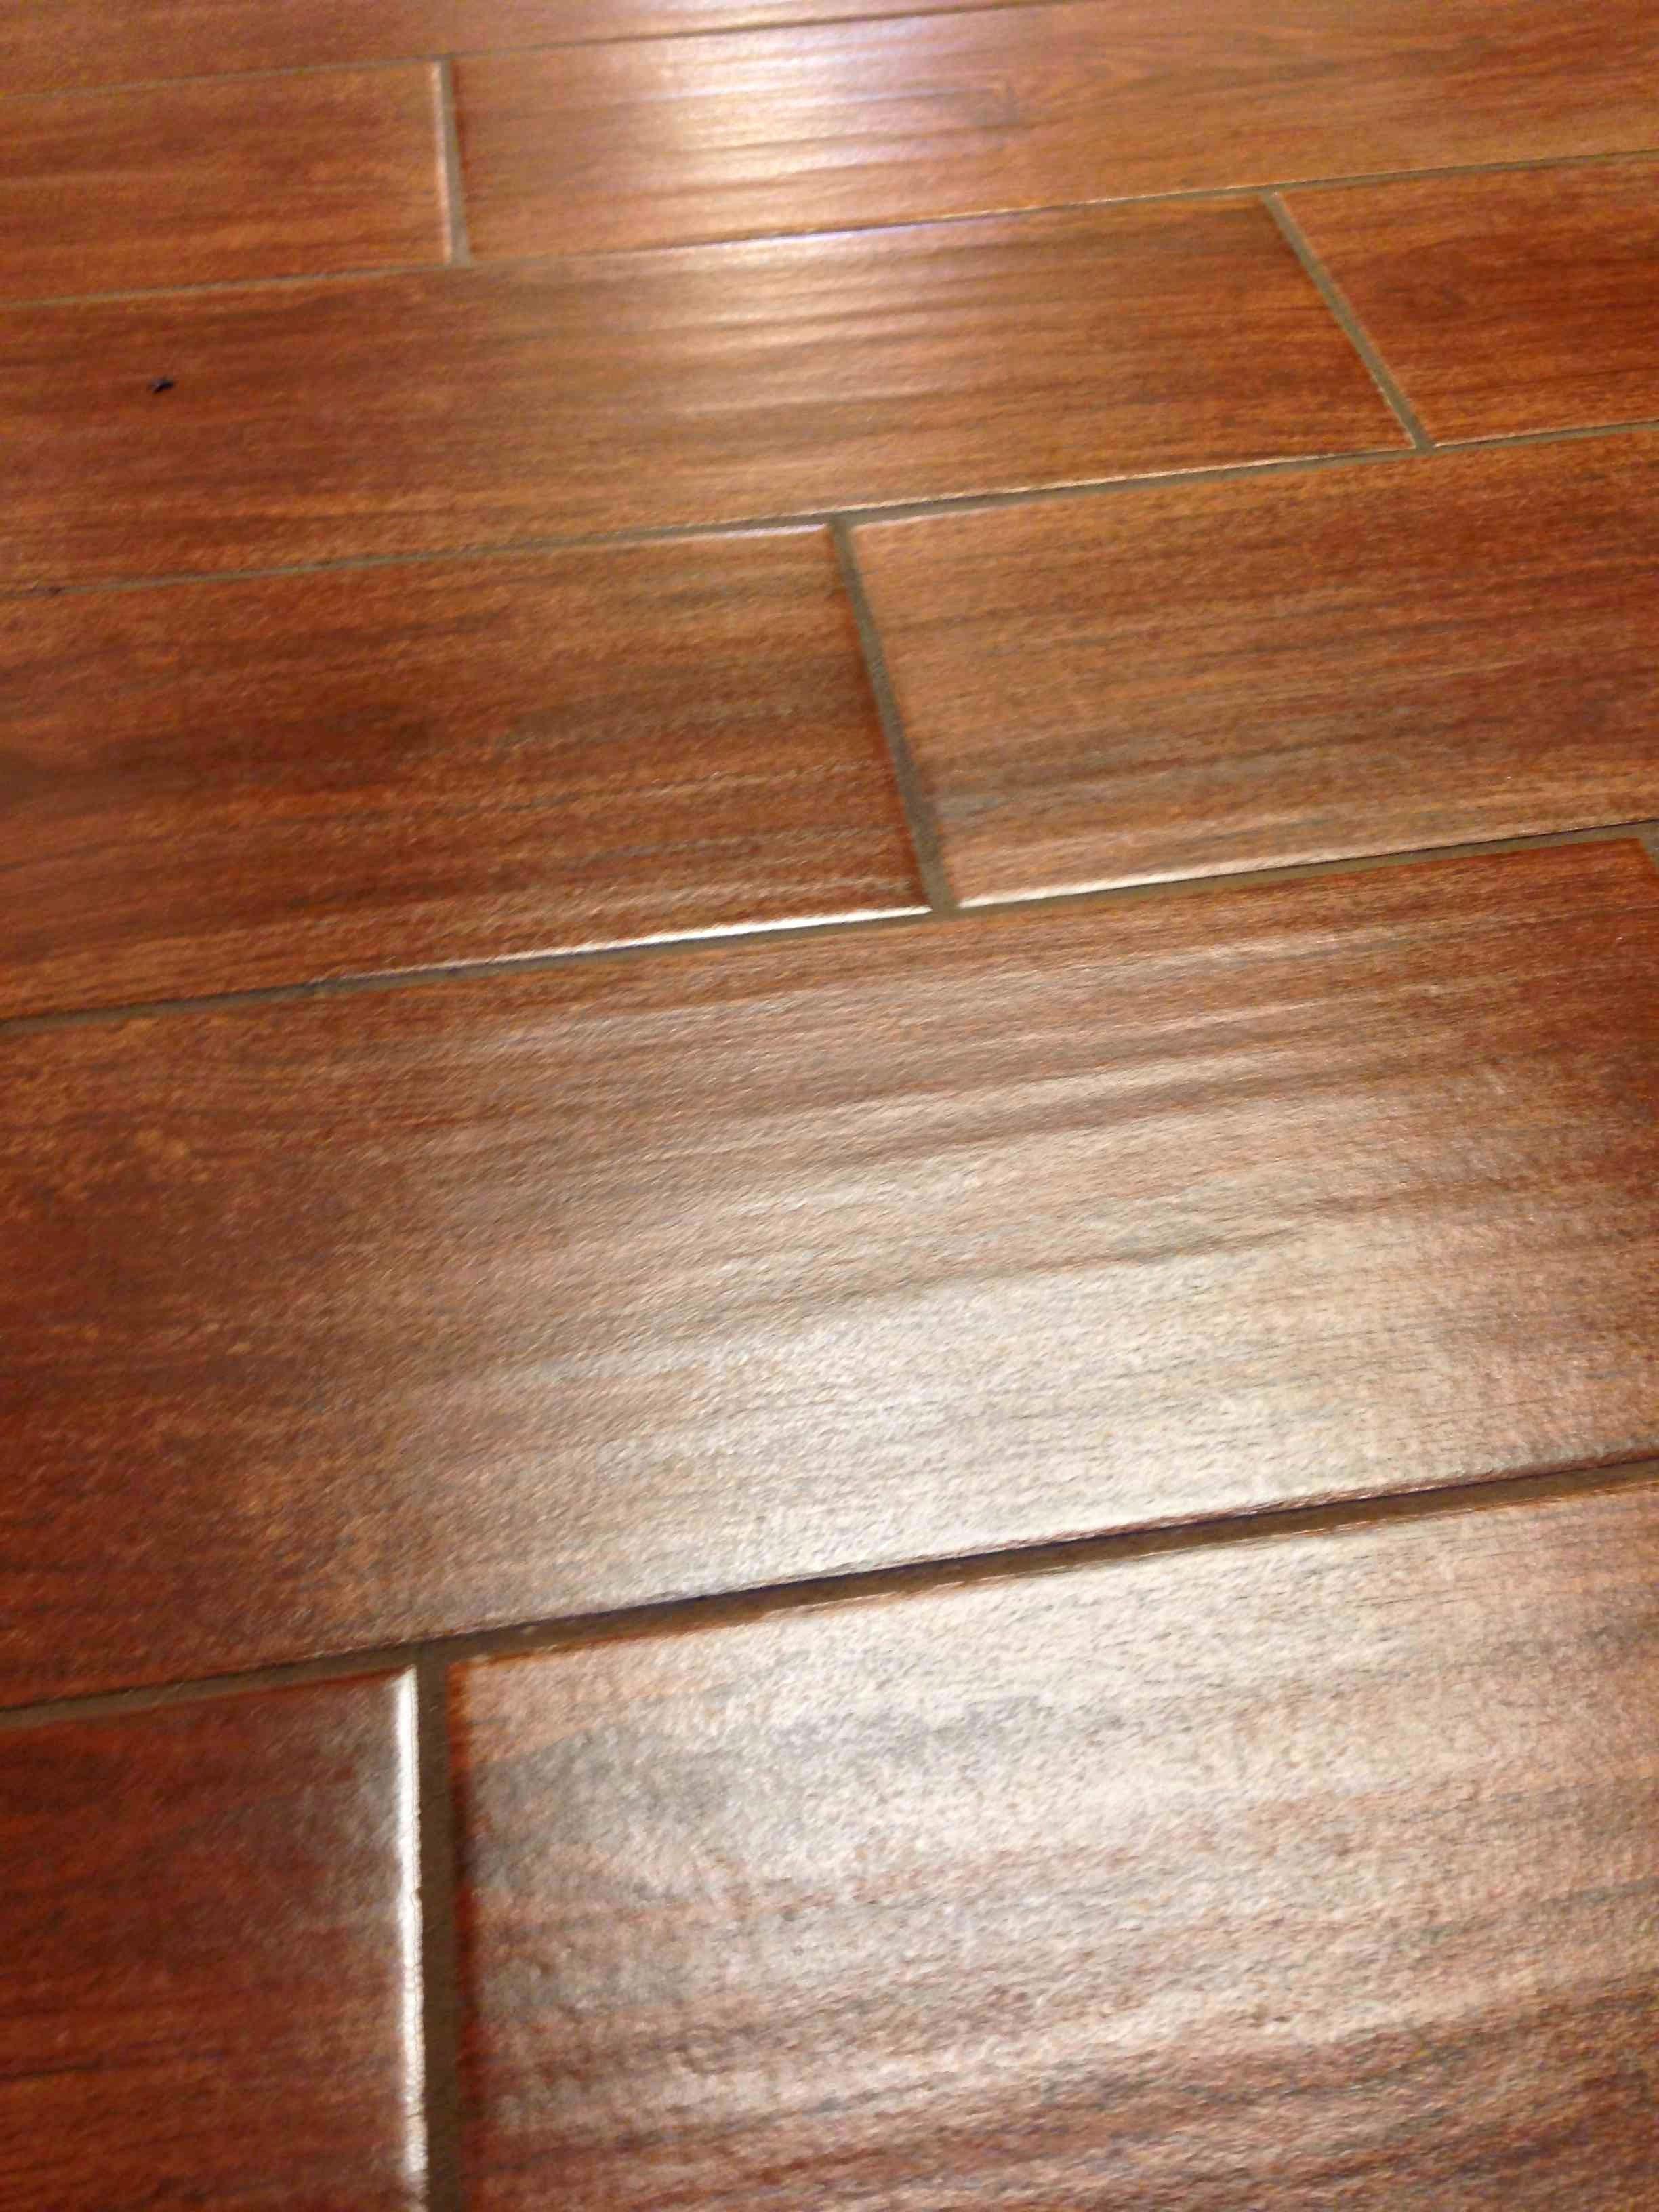 unfinished maple hardwood flooring sale of 19 new cheapest hardwood flooring photograph dizpos com inside cheapest hardwood flooring awesome wholesale hardwood flooring nj where to buy hardwood flooring stock of 19